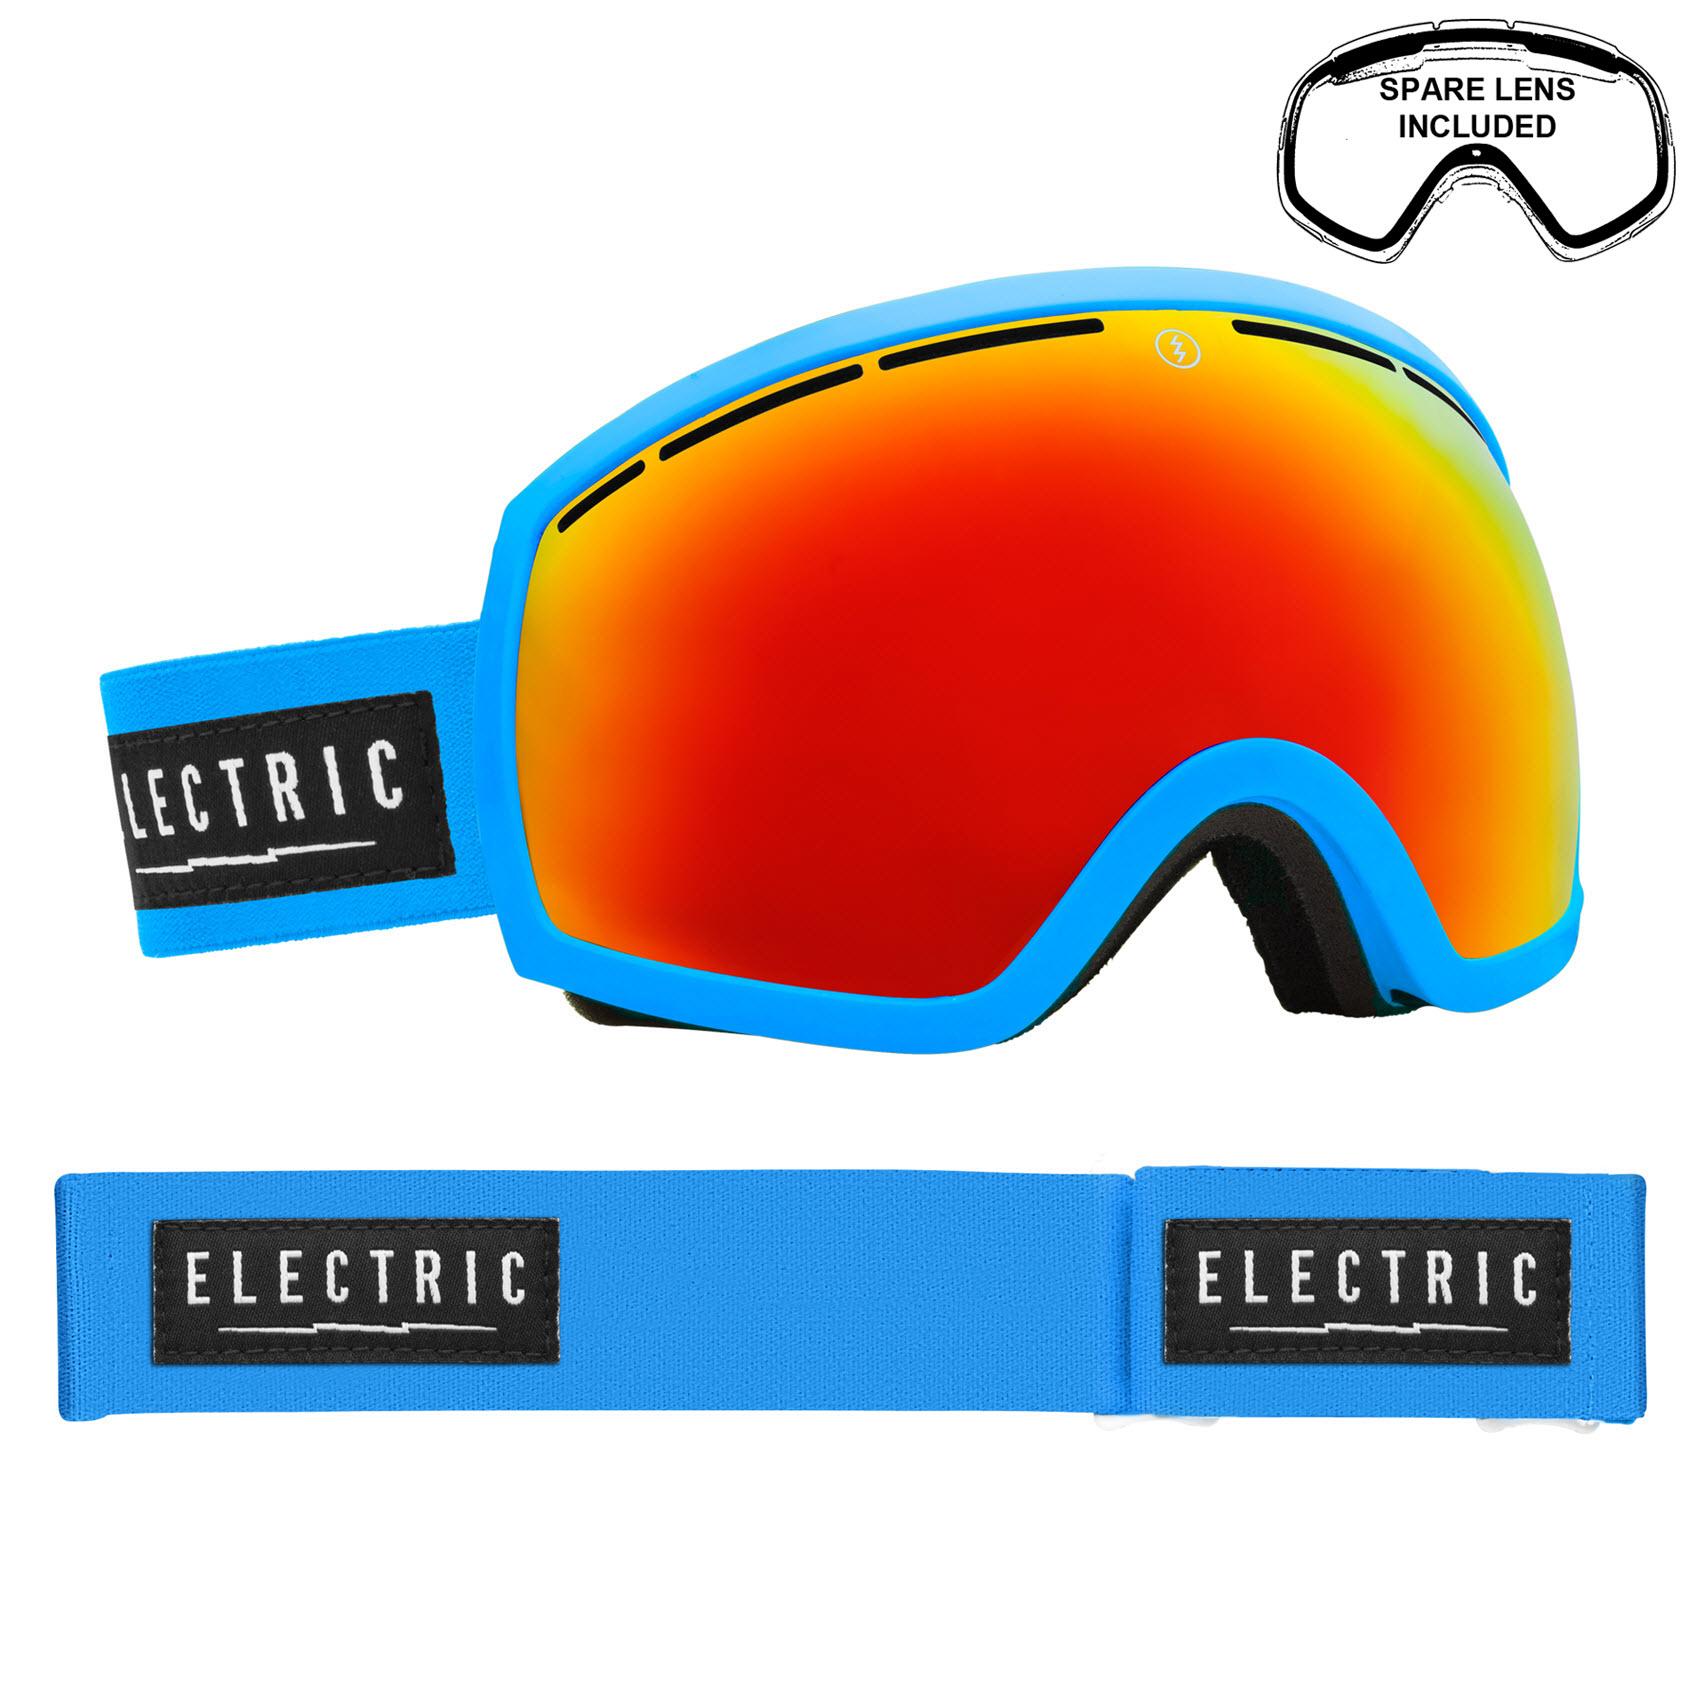 3fd0522c1fd Electric snowboard ski goggles including free spare low light jpg 1700x1700 Electric  ski goggles